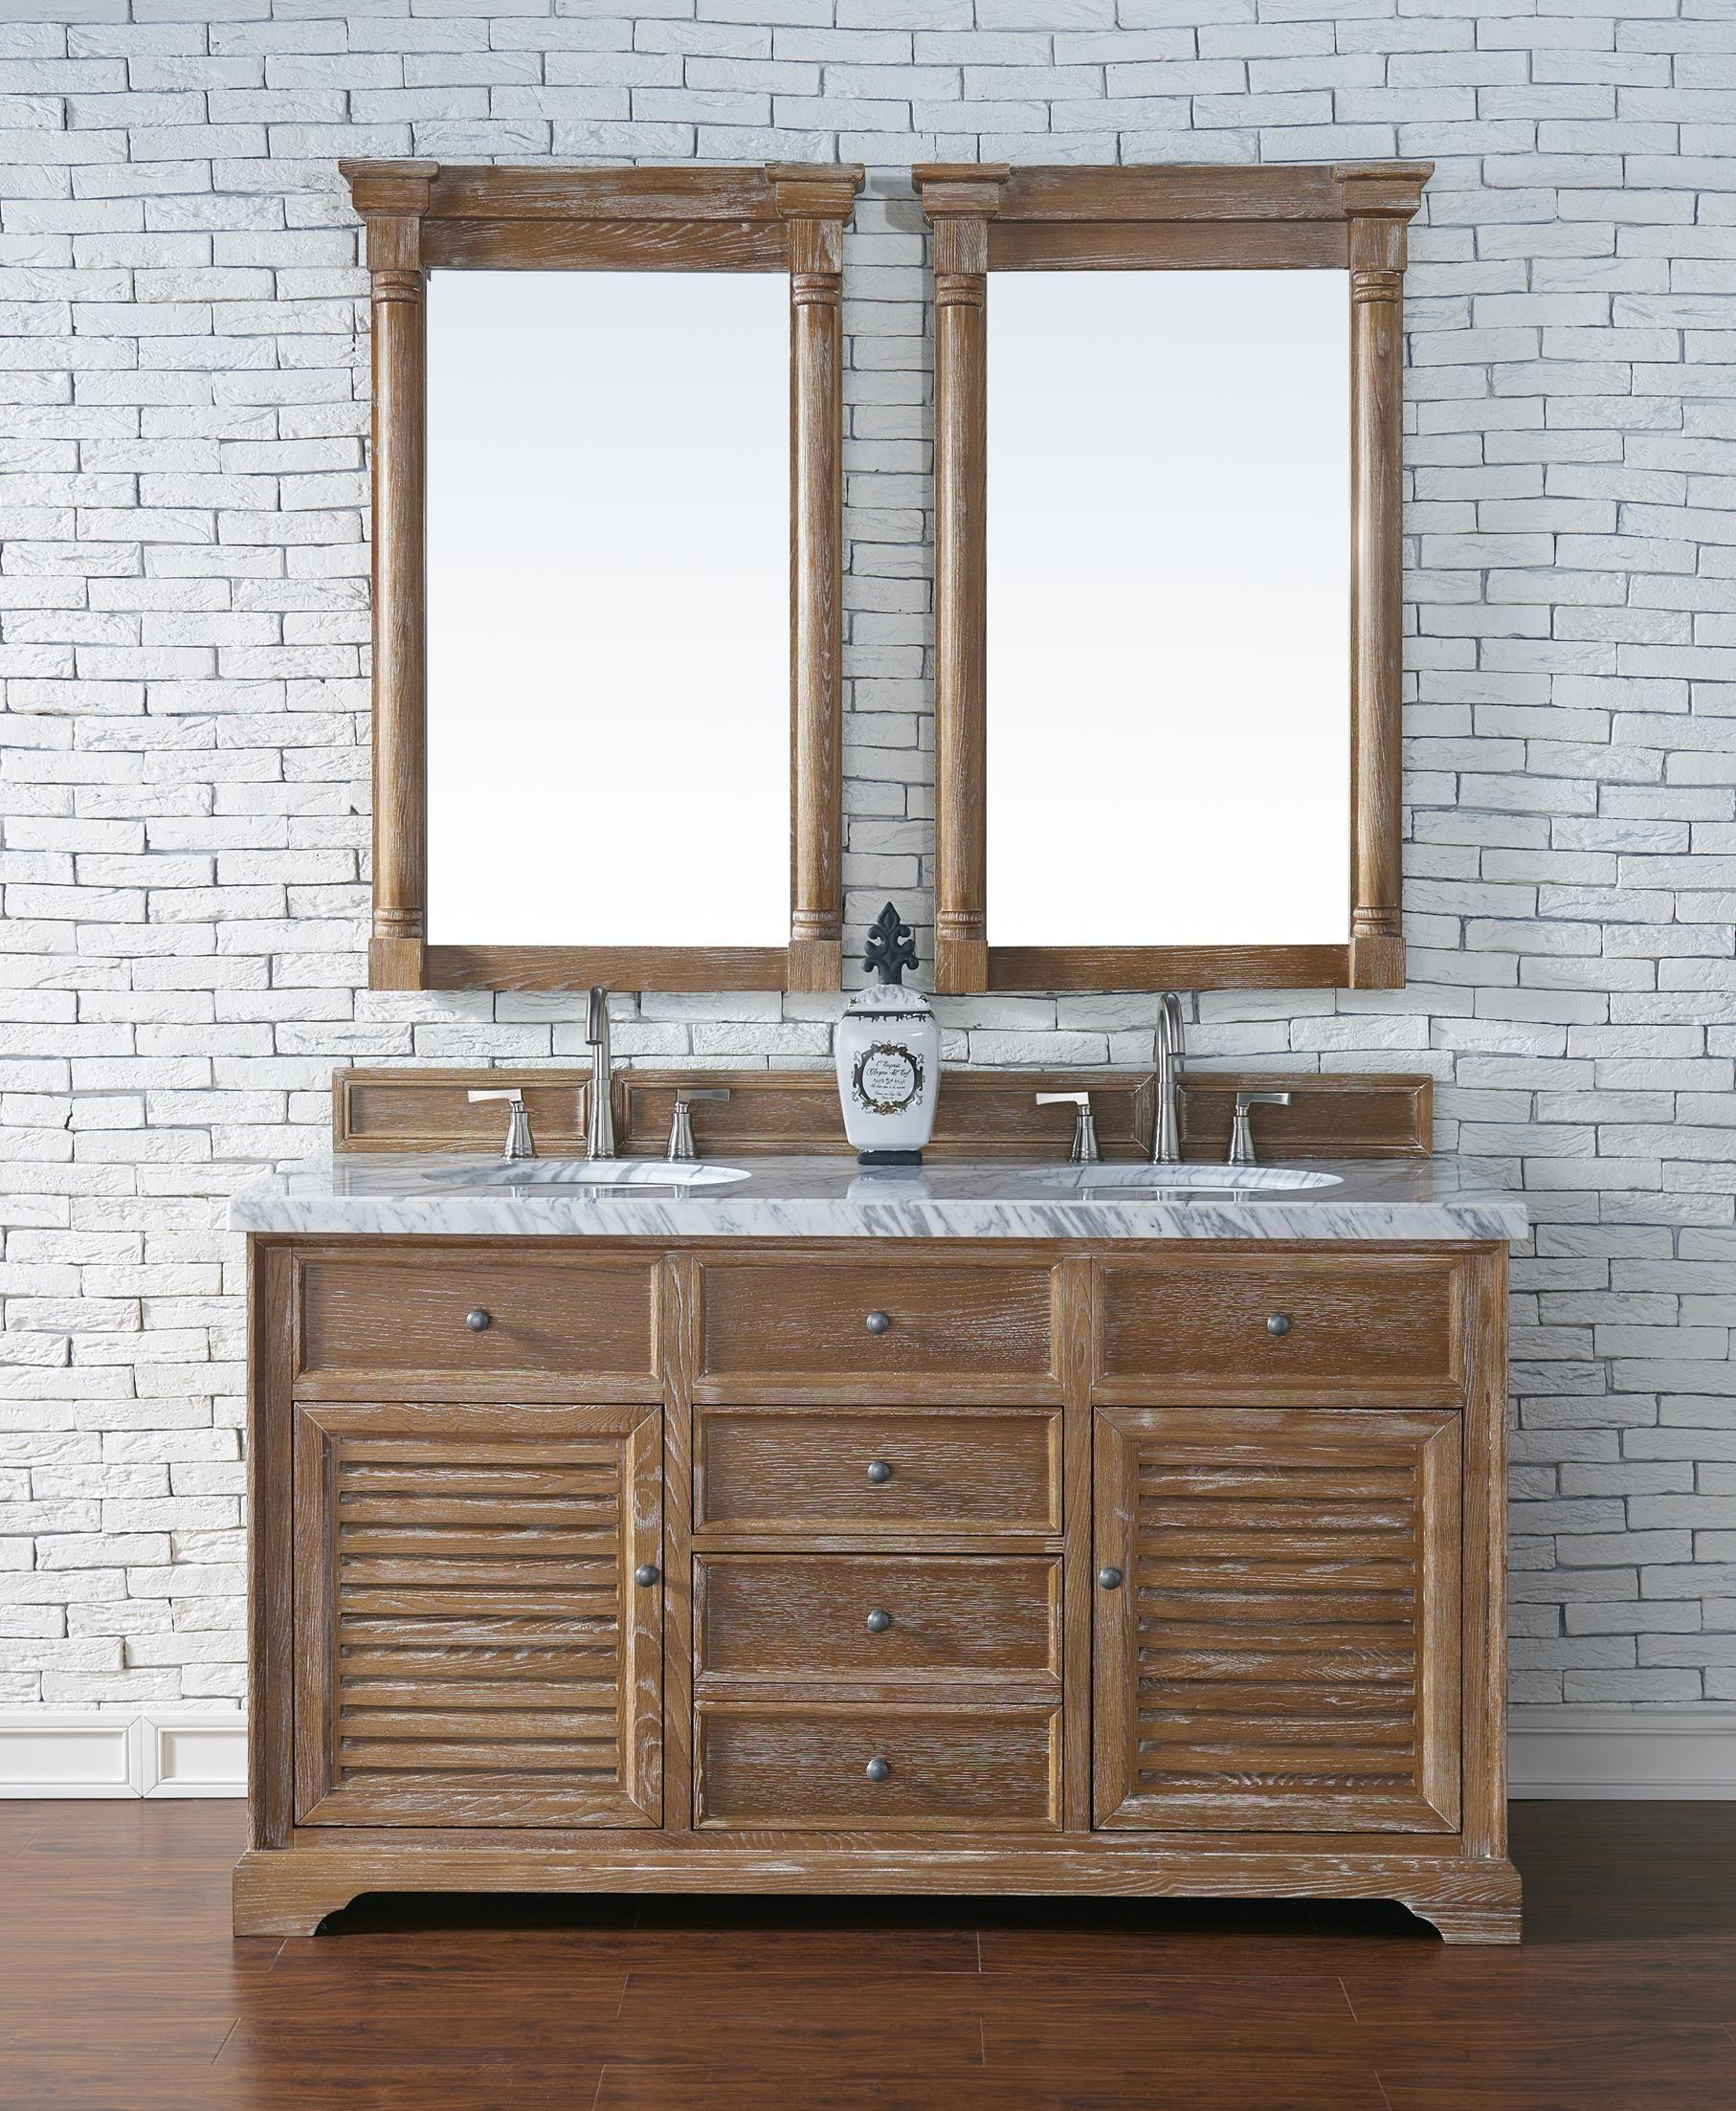 savannah 60 double sink bathroom vanity cabinet driftwood finish rh za pinterest com 22 Wood Sink Cabinet for Bathrooms in Concrete Oak Bathroom Vanity Cabinets